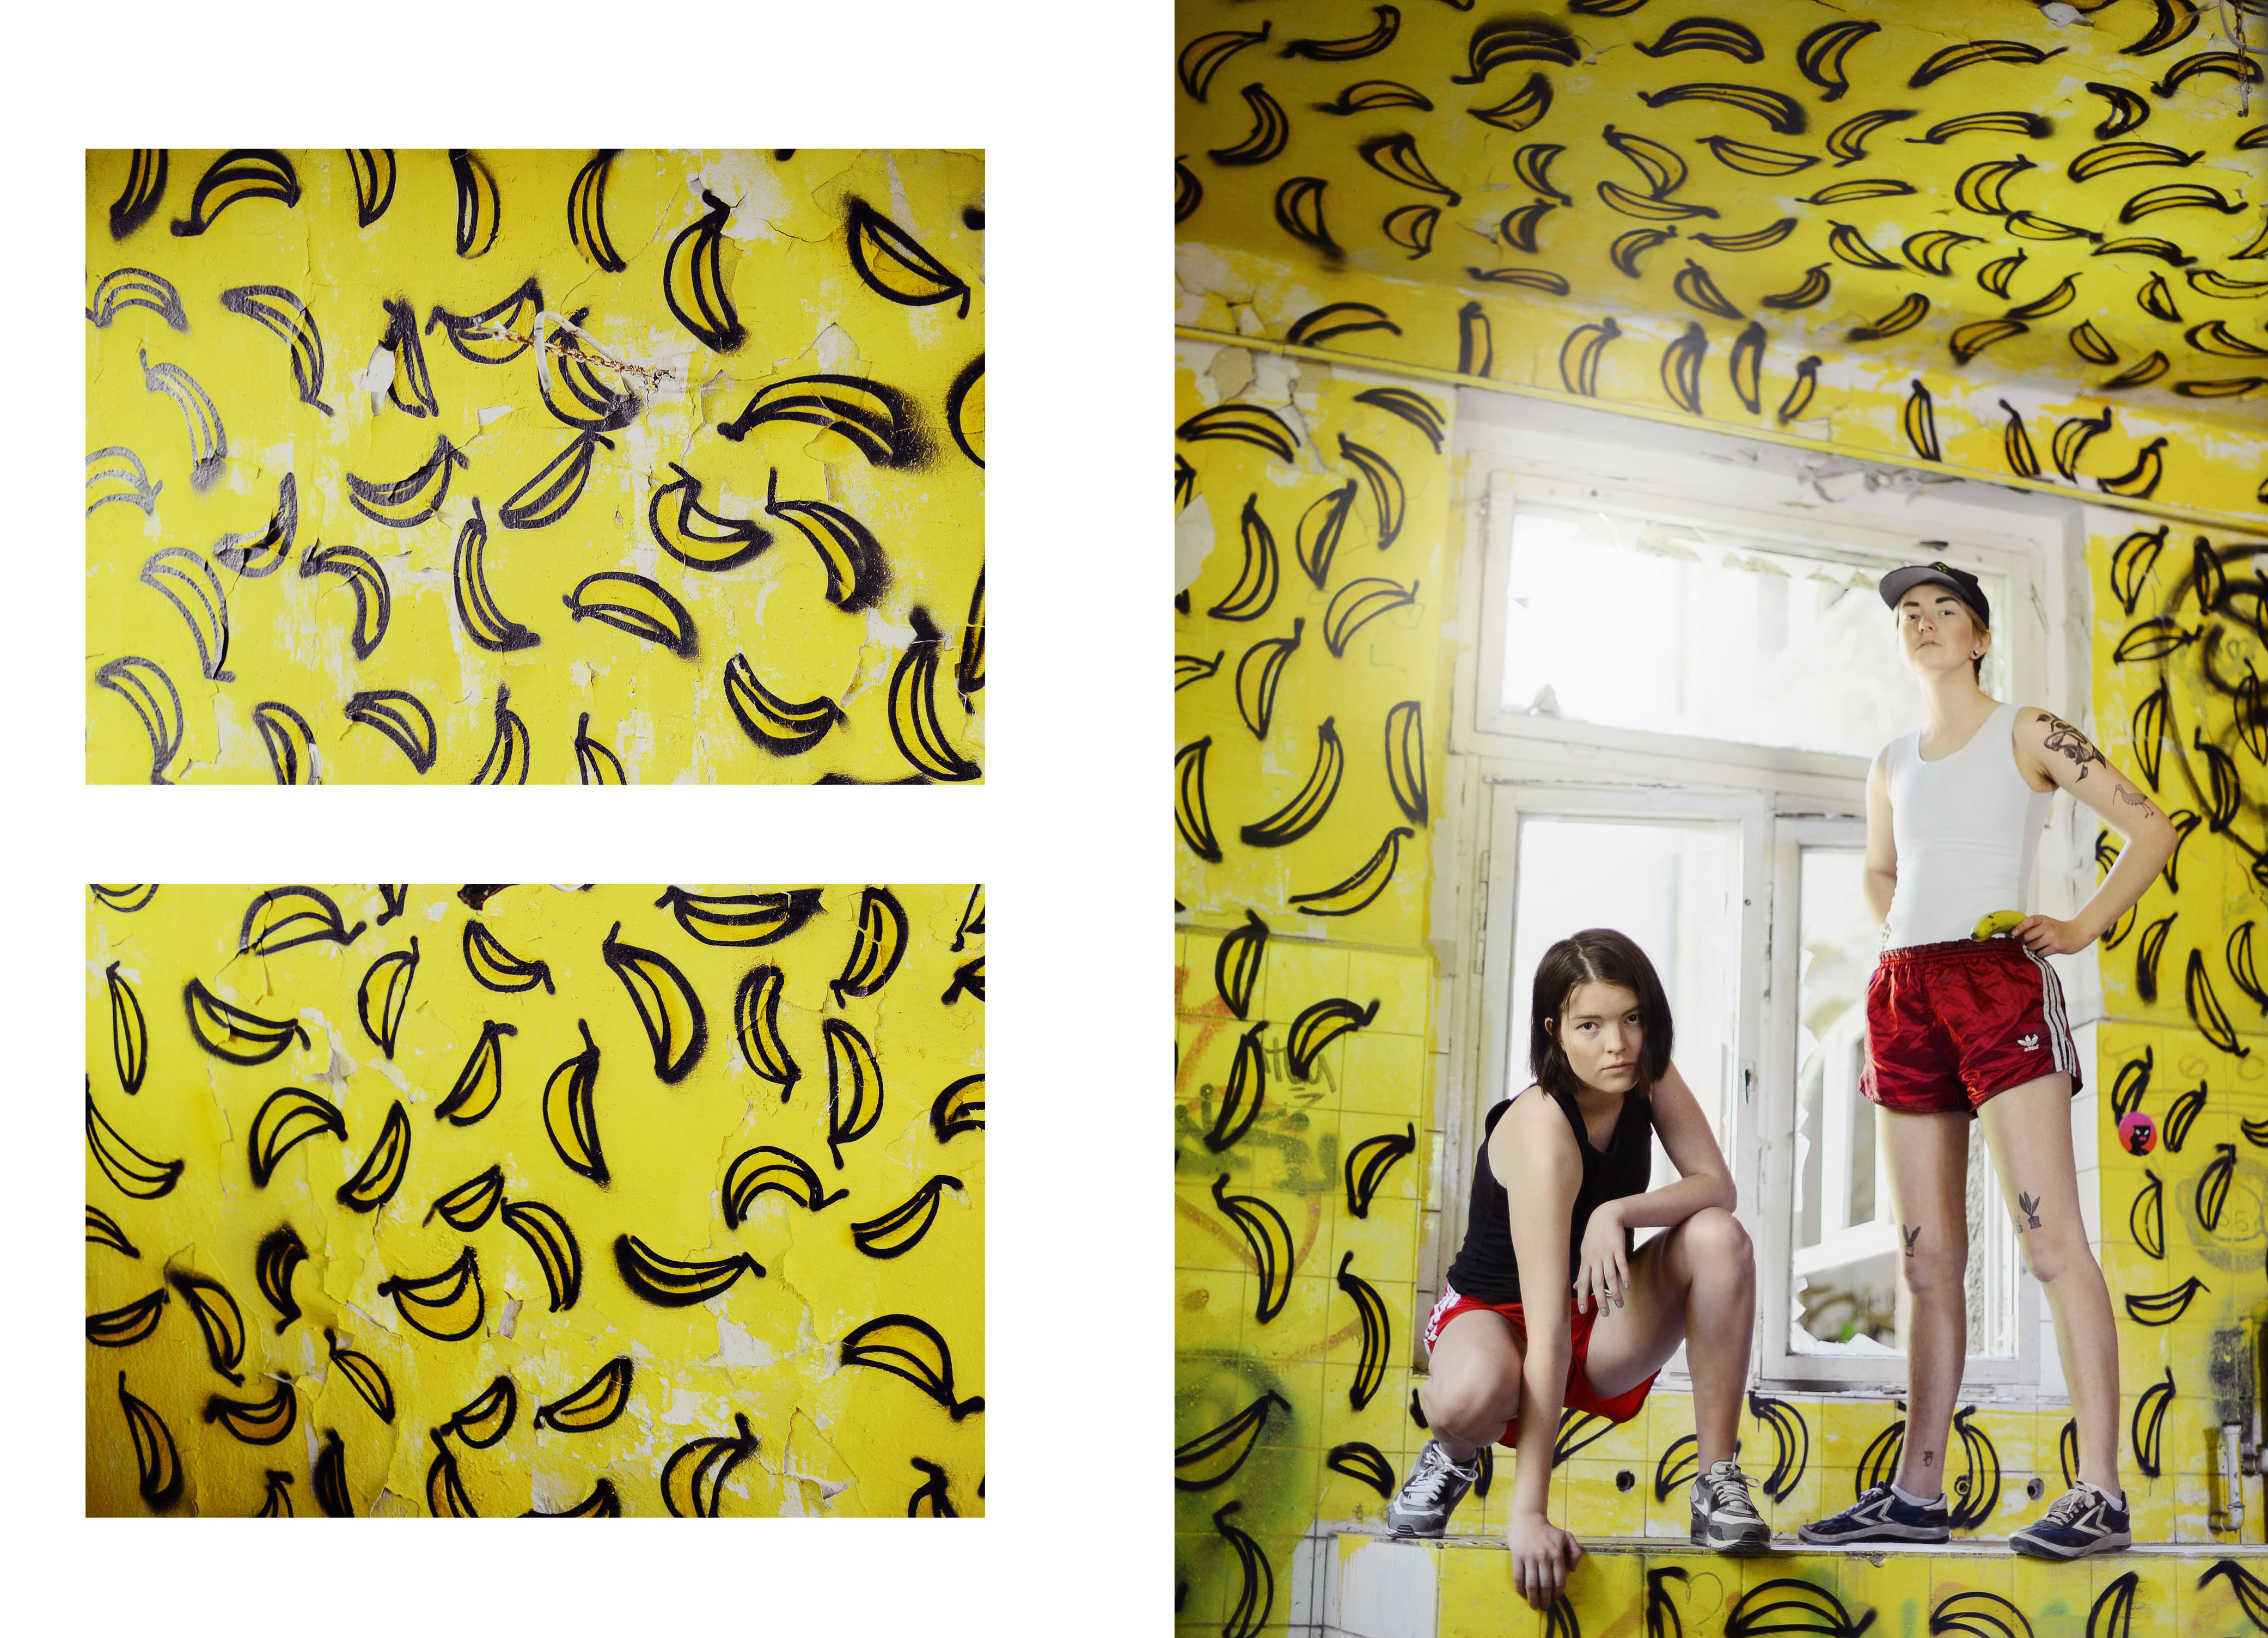 bananaz33